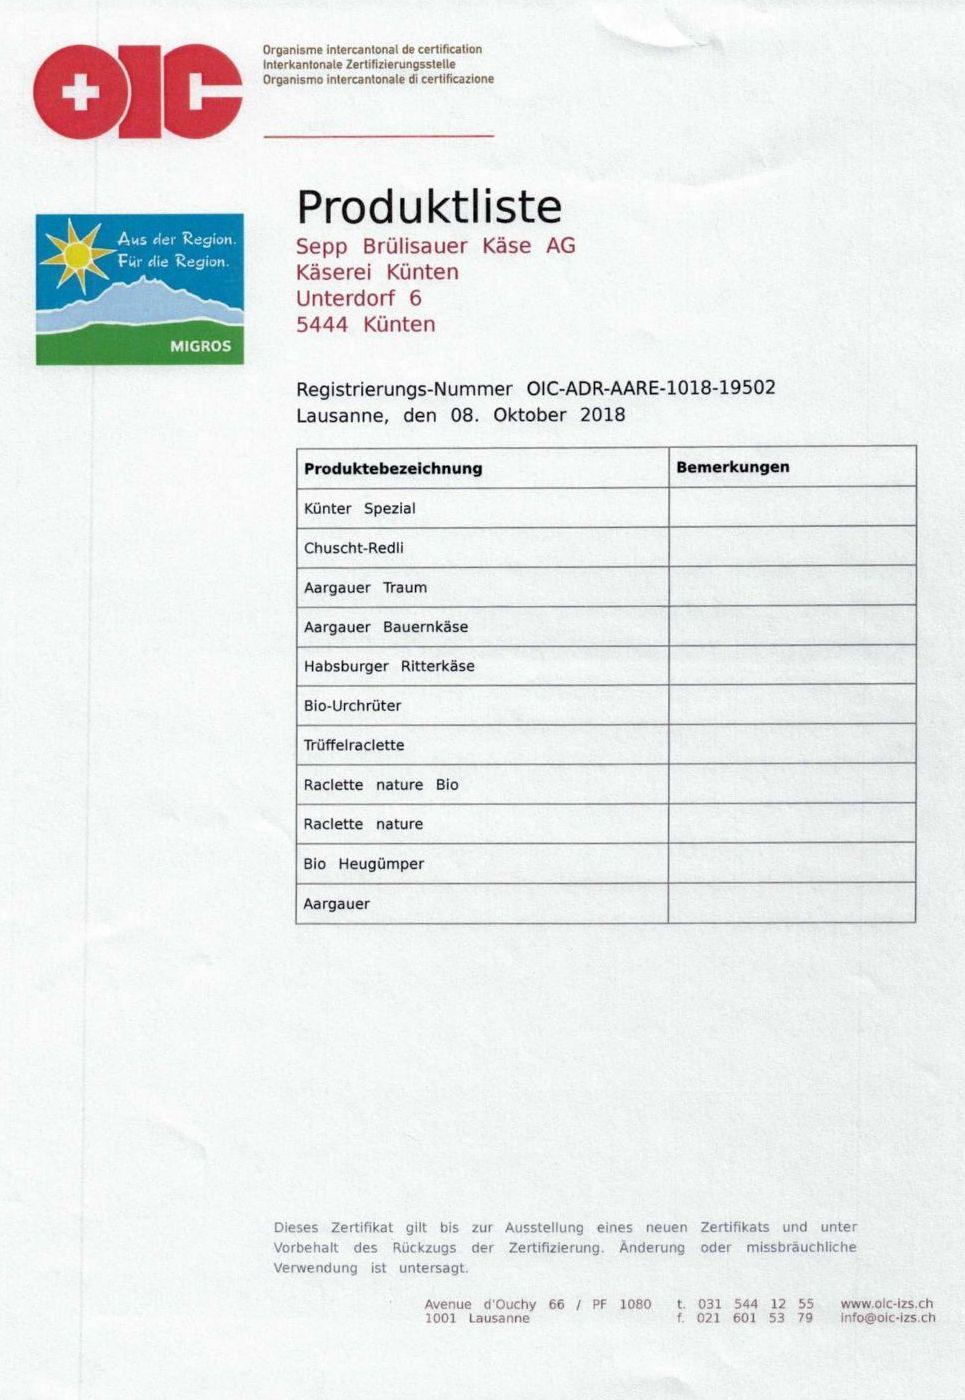 ADR Zertifikat Produkteliste